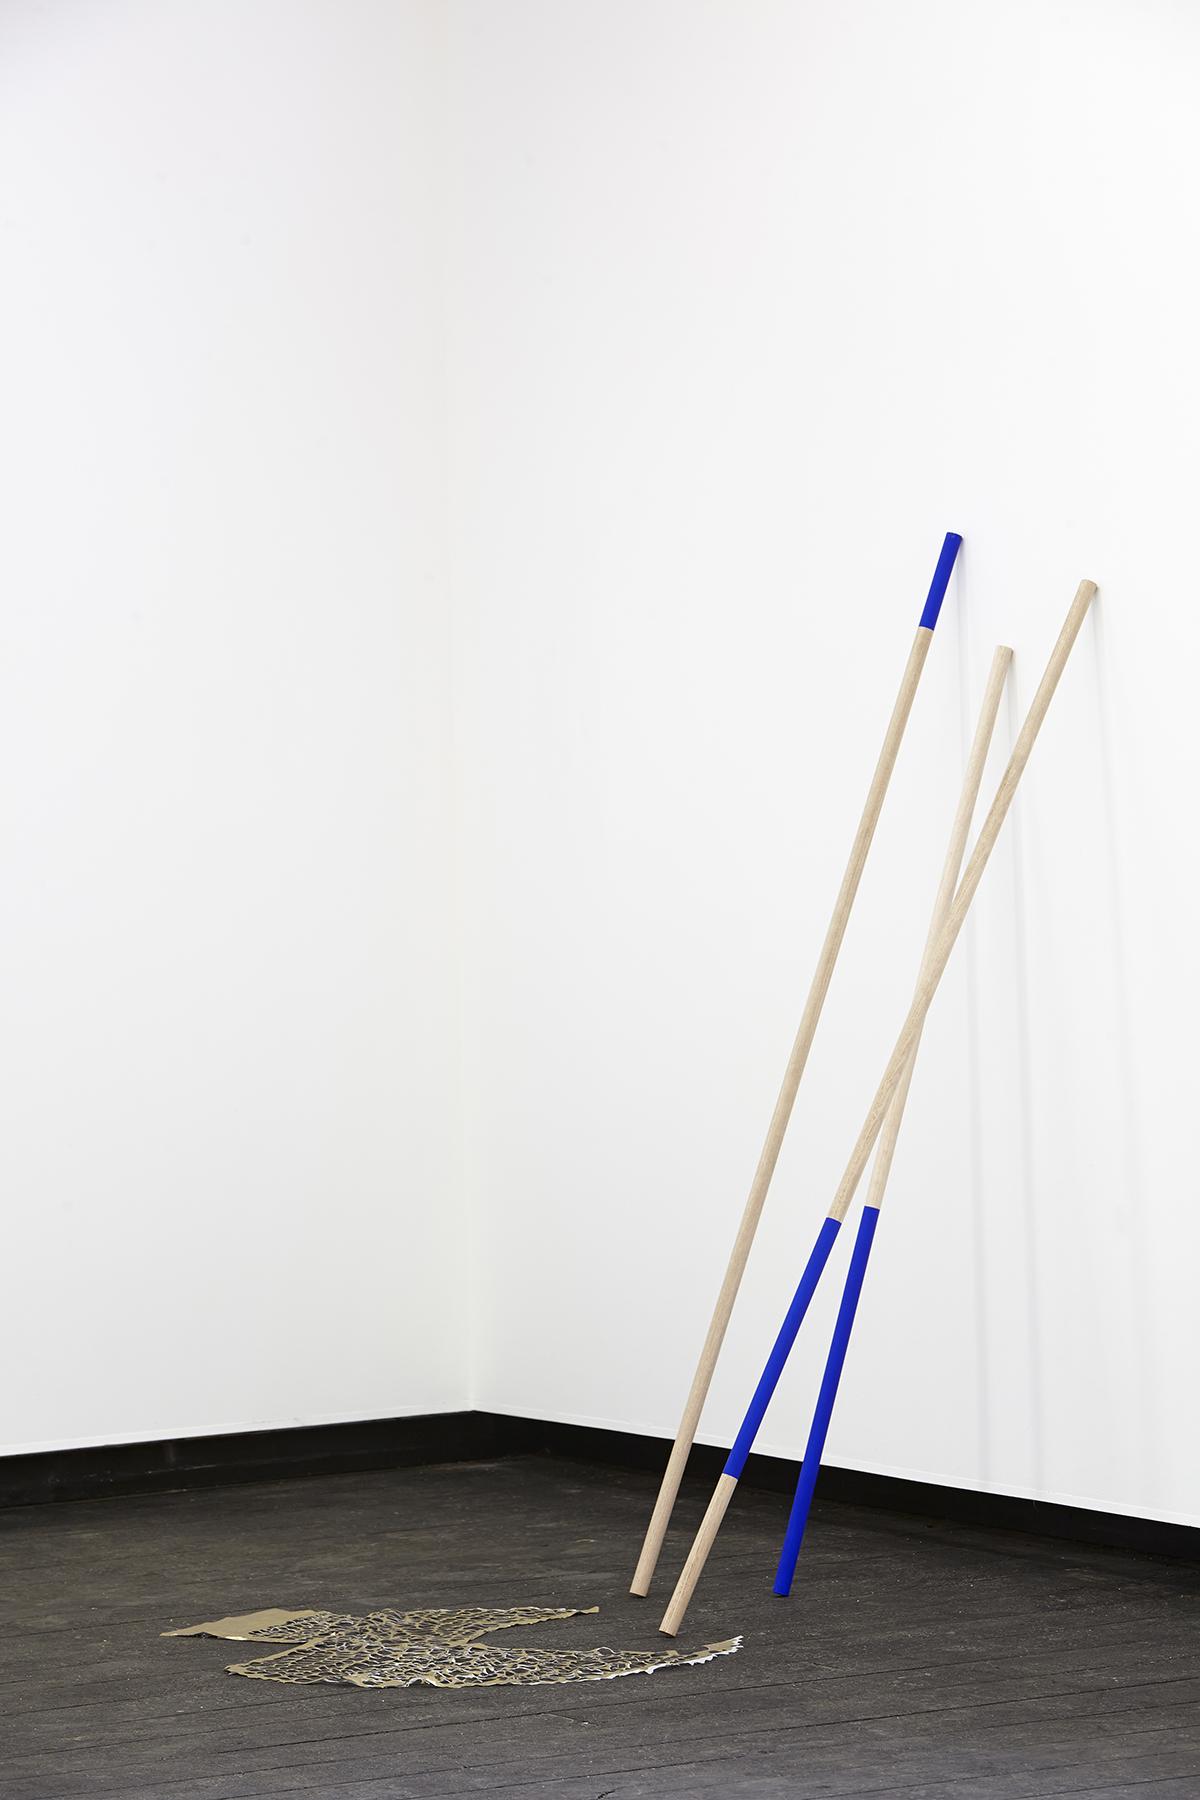 Firstdraft-2014-May-awkward-voltas-photo-by-zan-wimberley-02.jpg